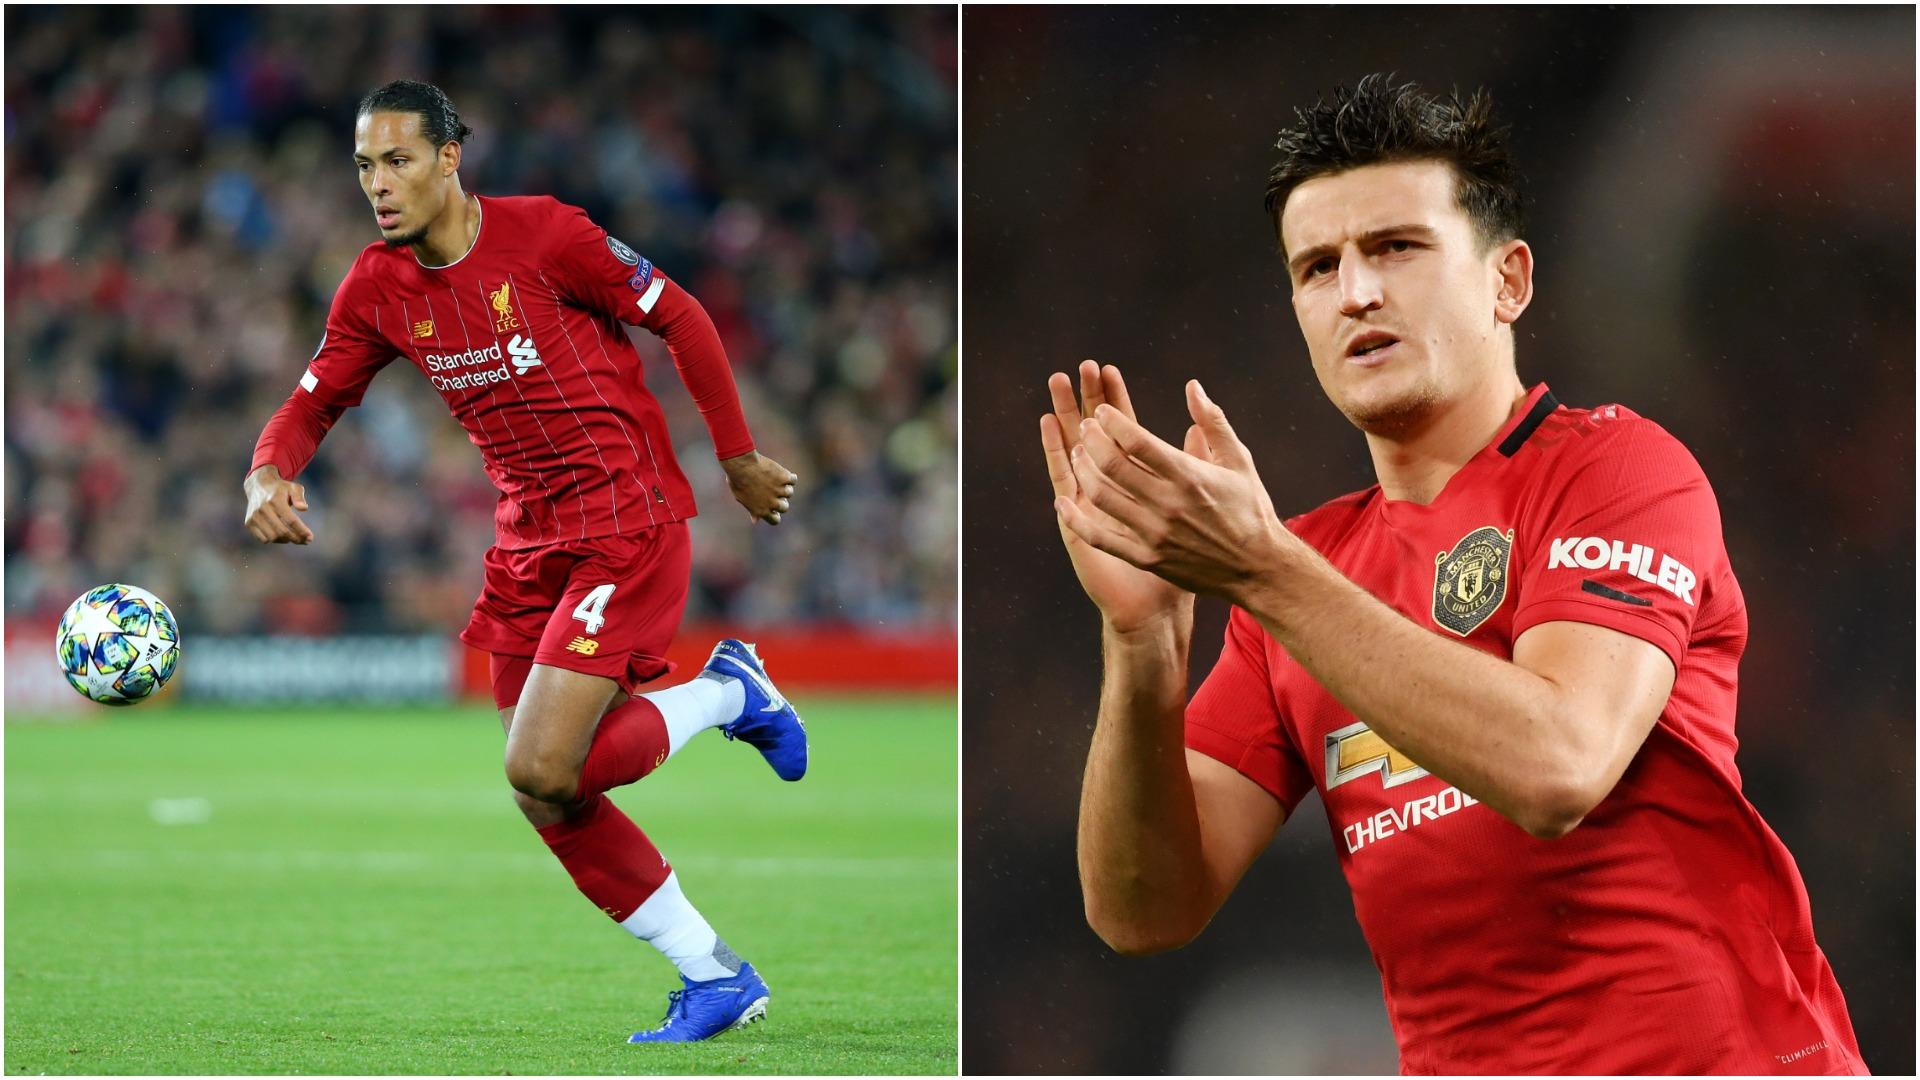 Manchester United v Liverpool: How does Maguire stack up against Van Dijk?